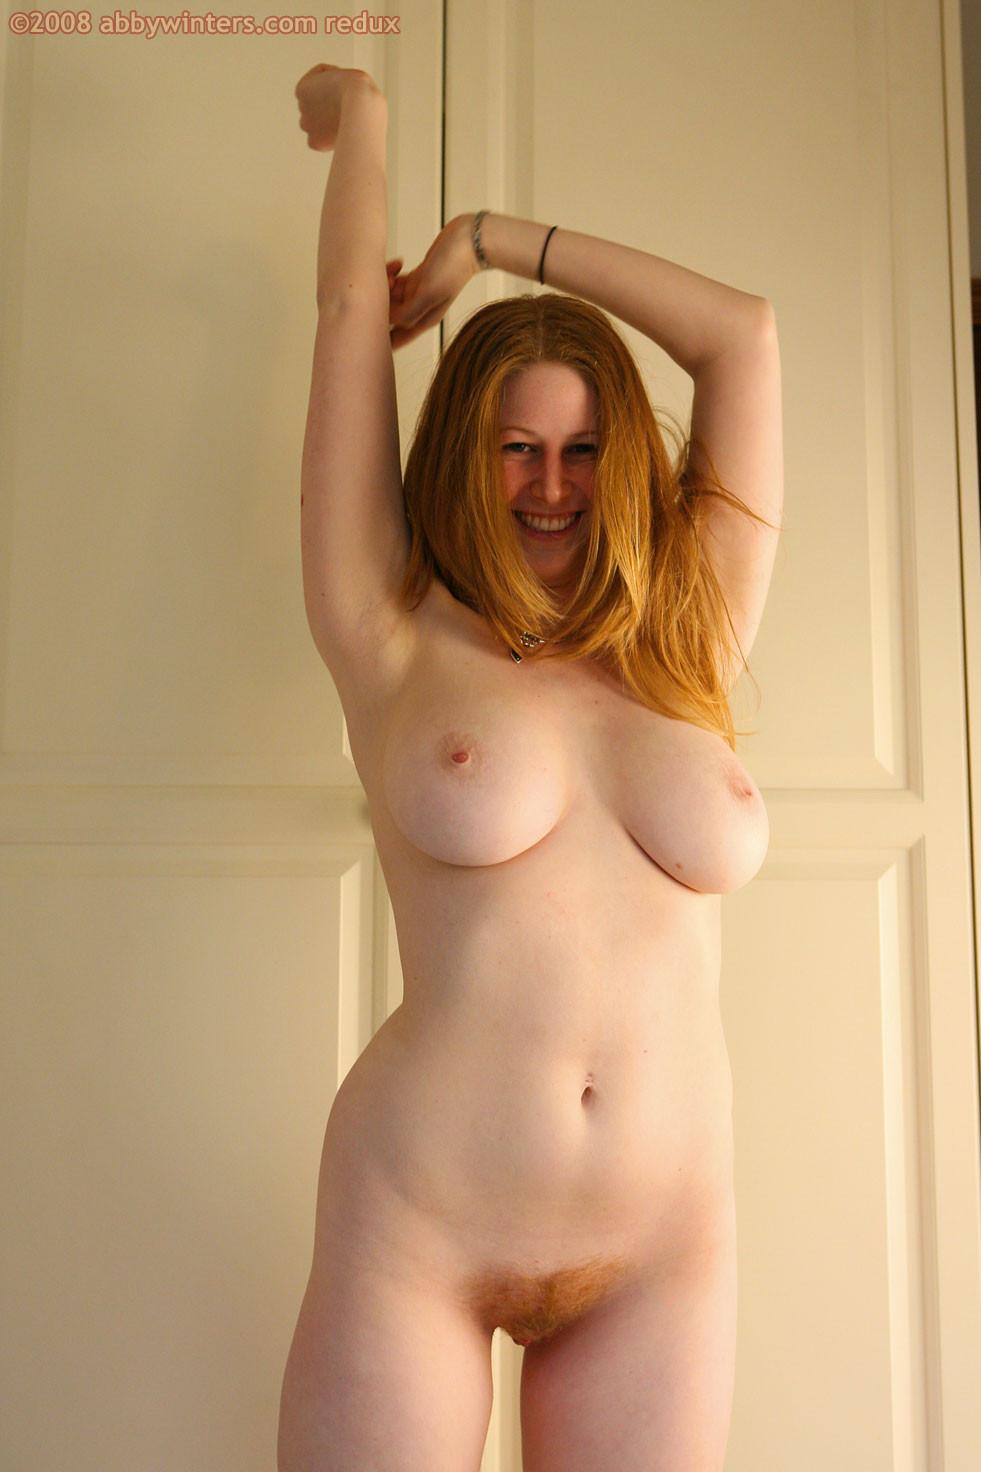 Australian redhead cloe b